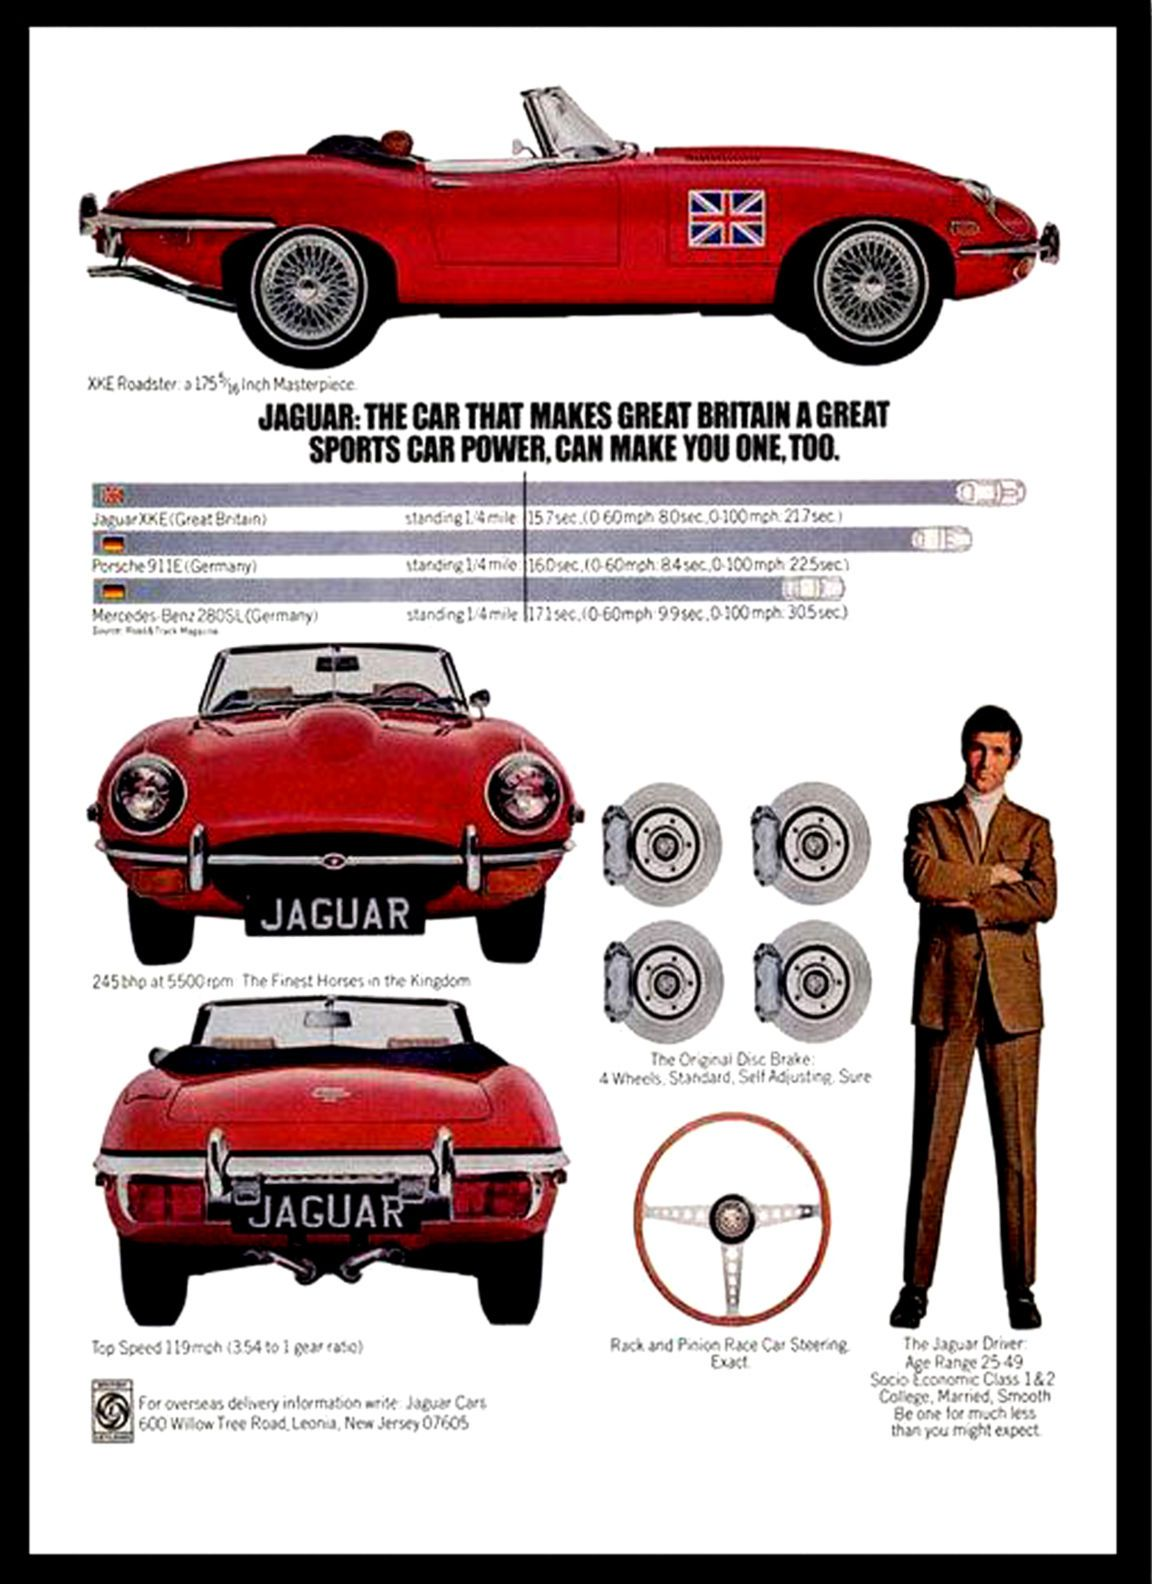 A3 - Wall POSTER Print Art - E-Type jaguar 1969 Retro Vintage Car Advert - #1